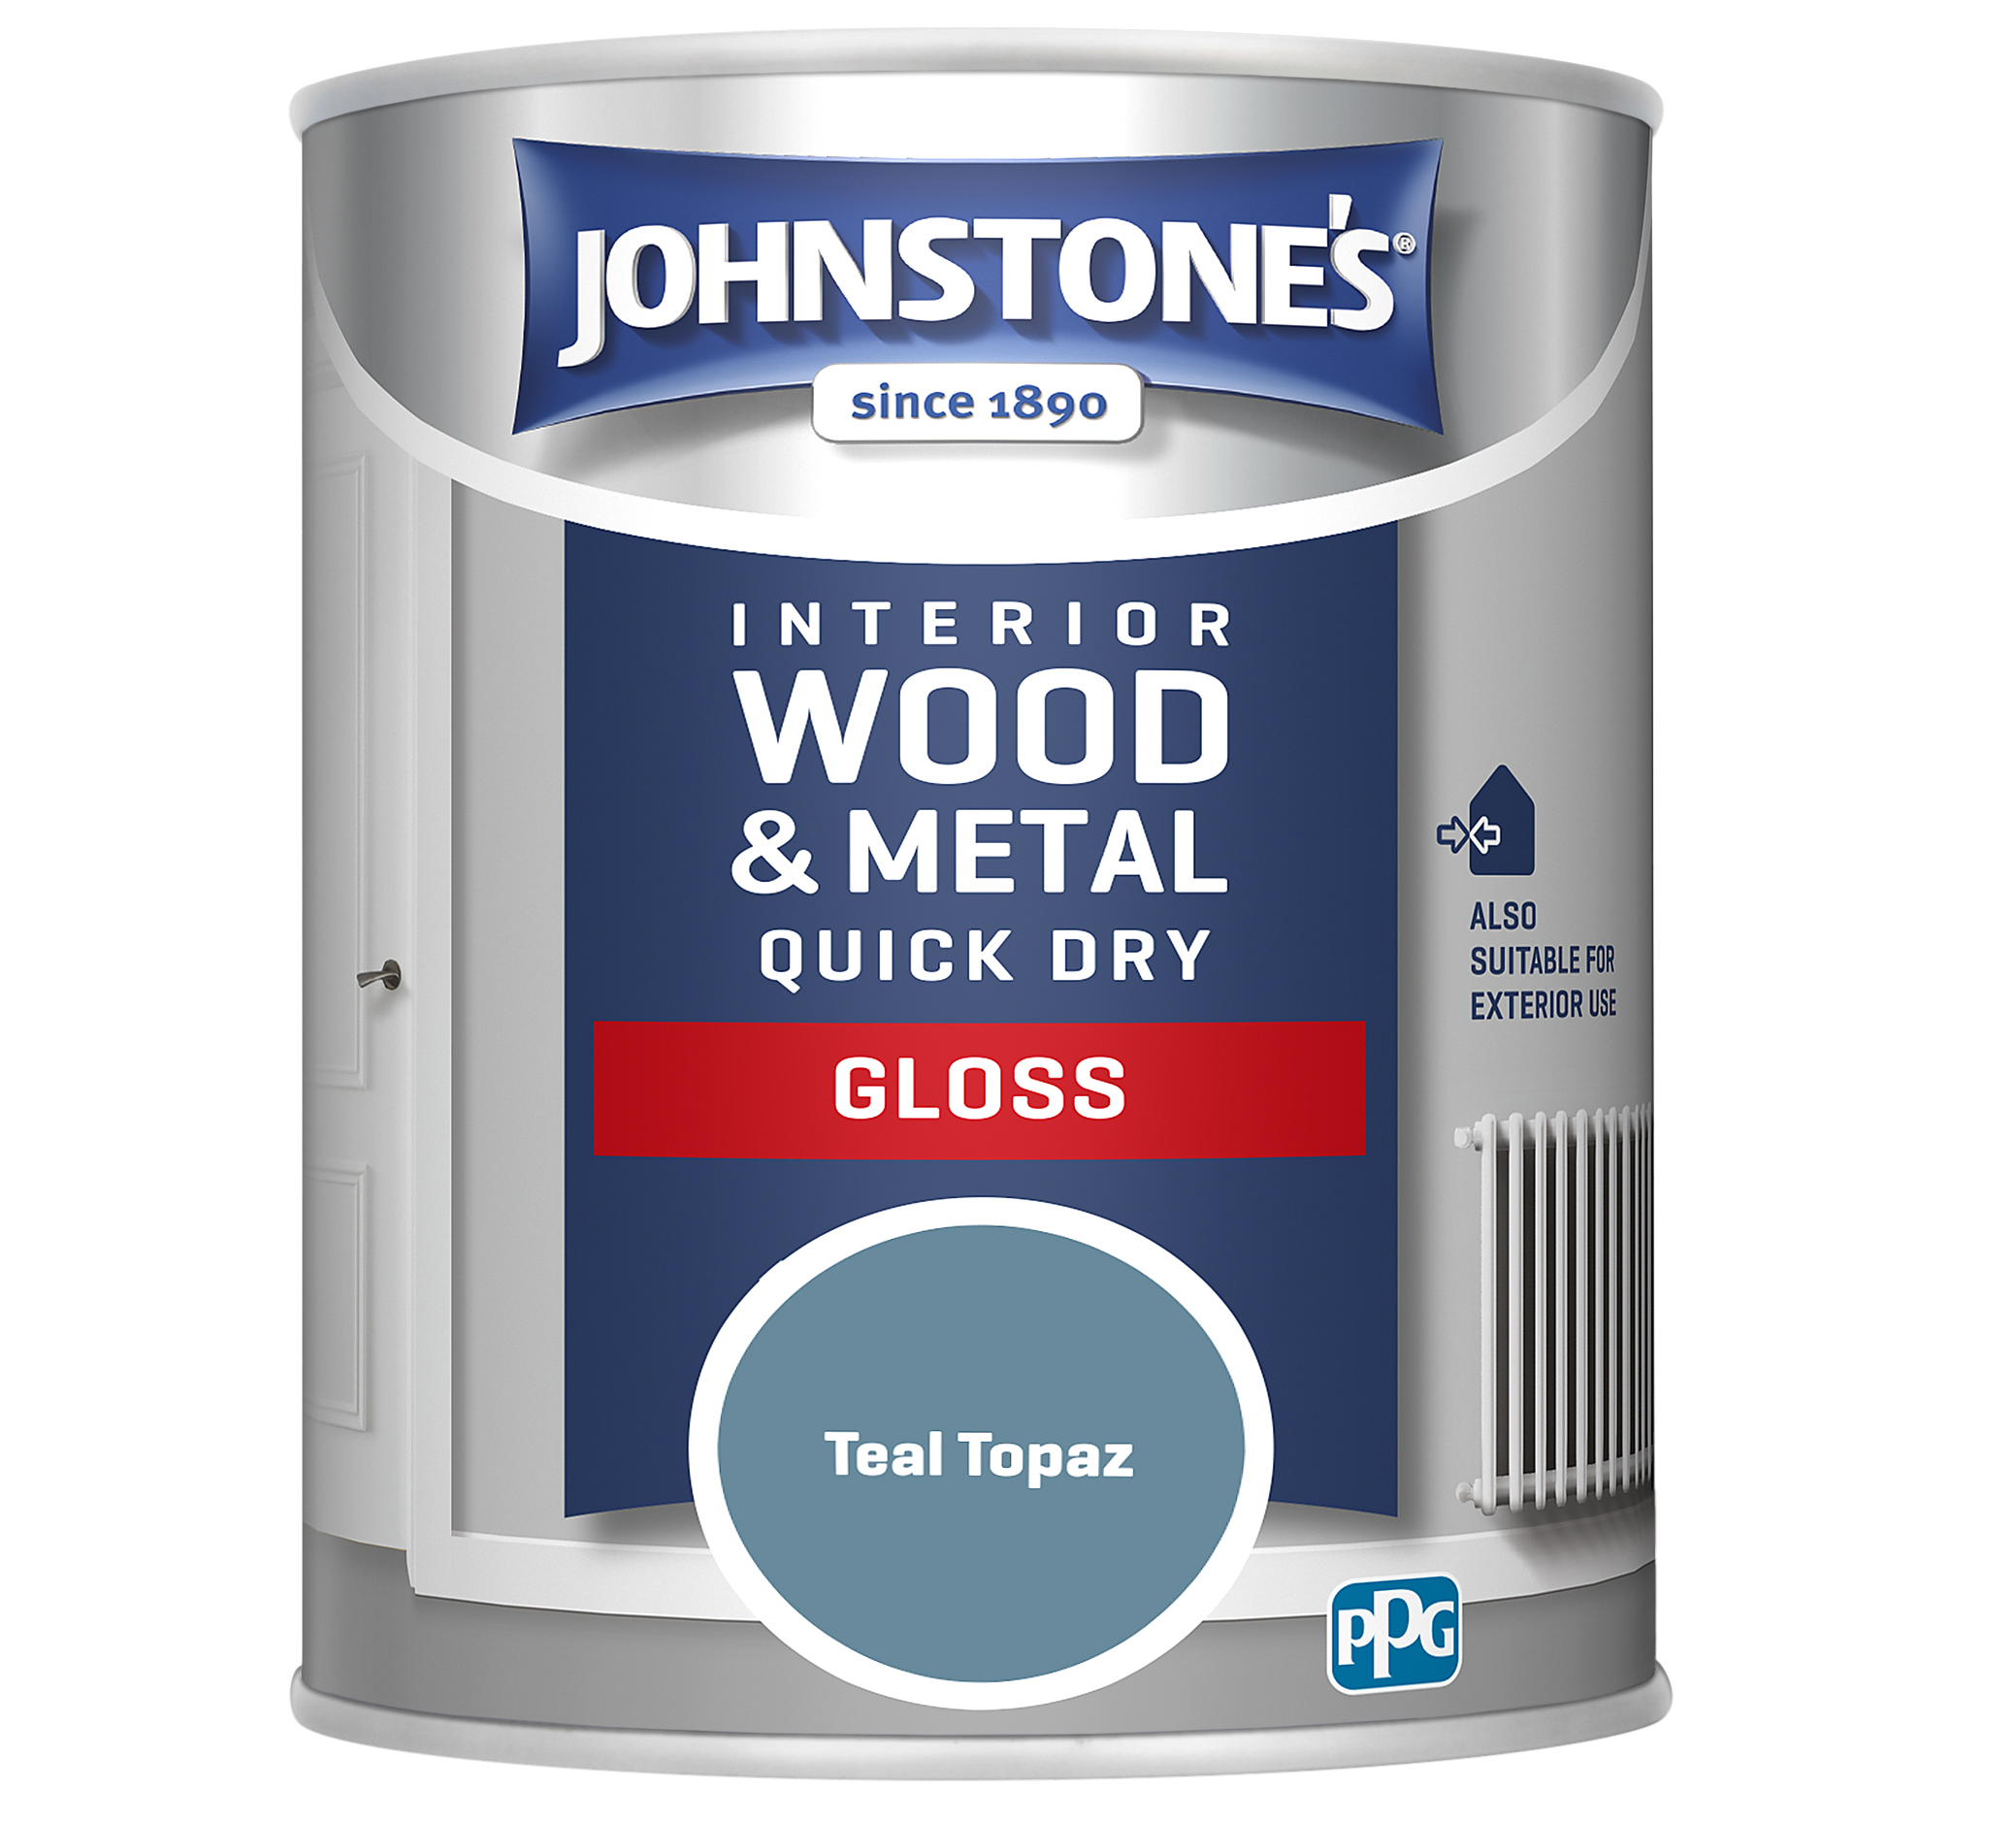 Johnstones 750ml Quick Dry Gloss Paint - Teal Topaz